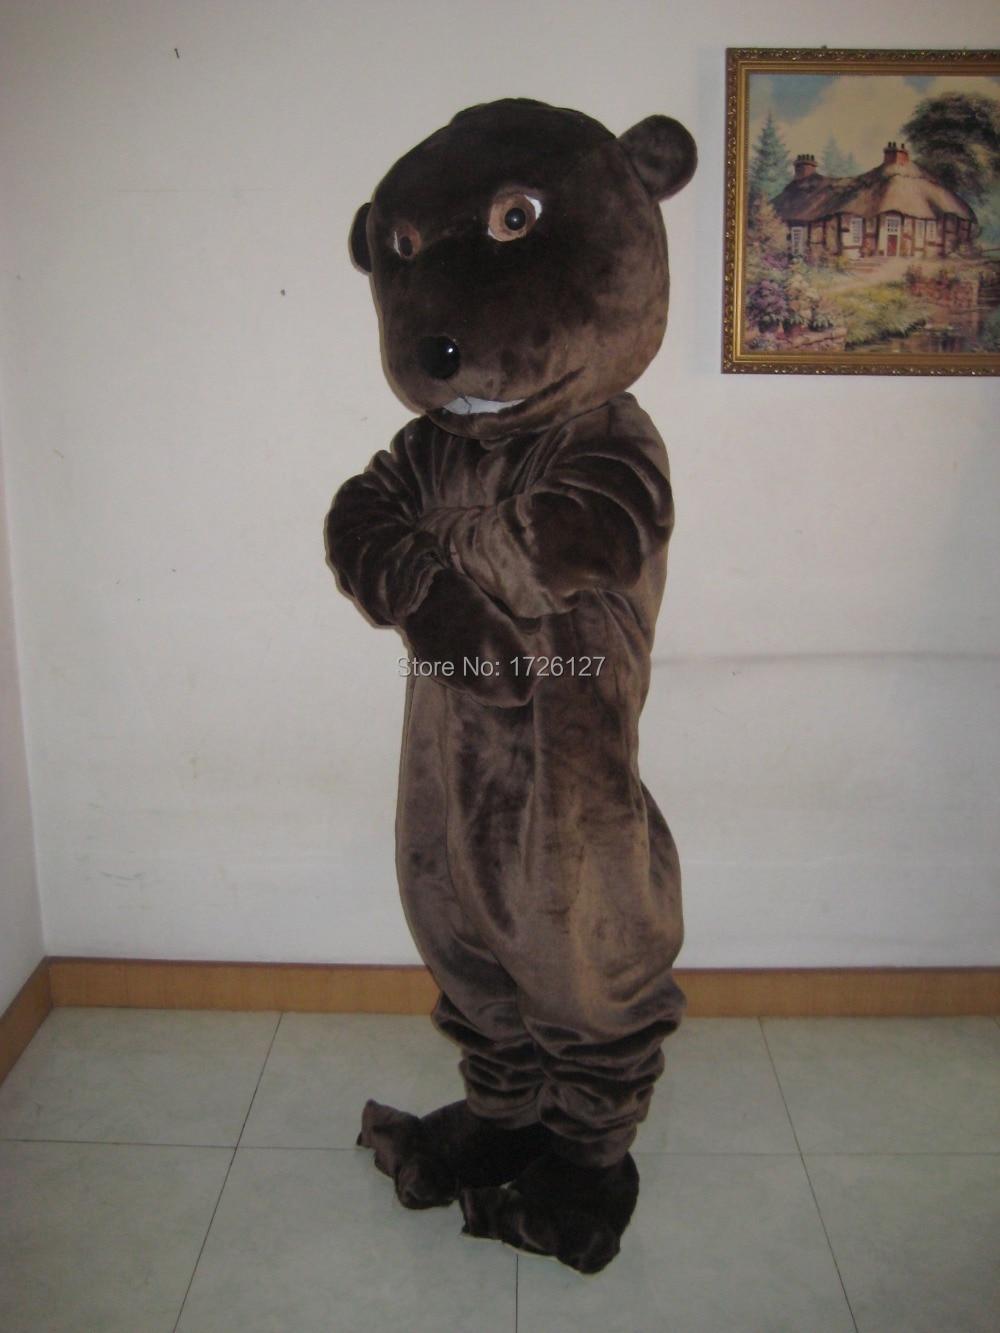 Disfraz de mascota castor sinotrtor castor, disfraz de fantasía personalizado, disfraz de anime, disfraz de Carnaval